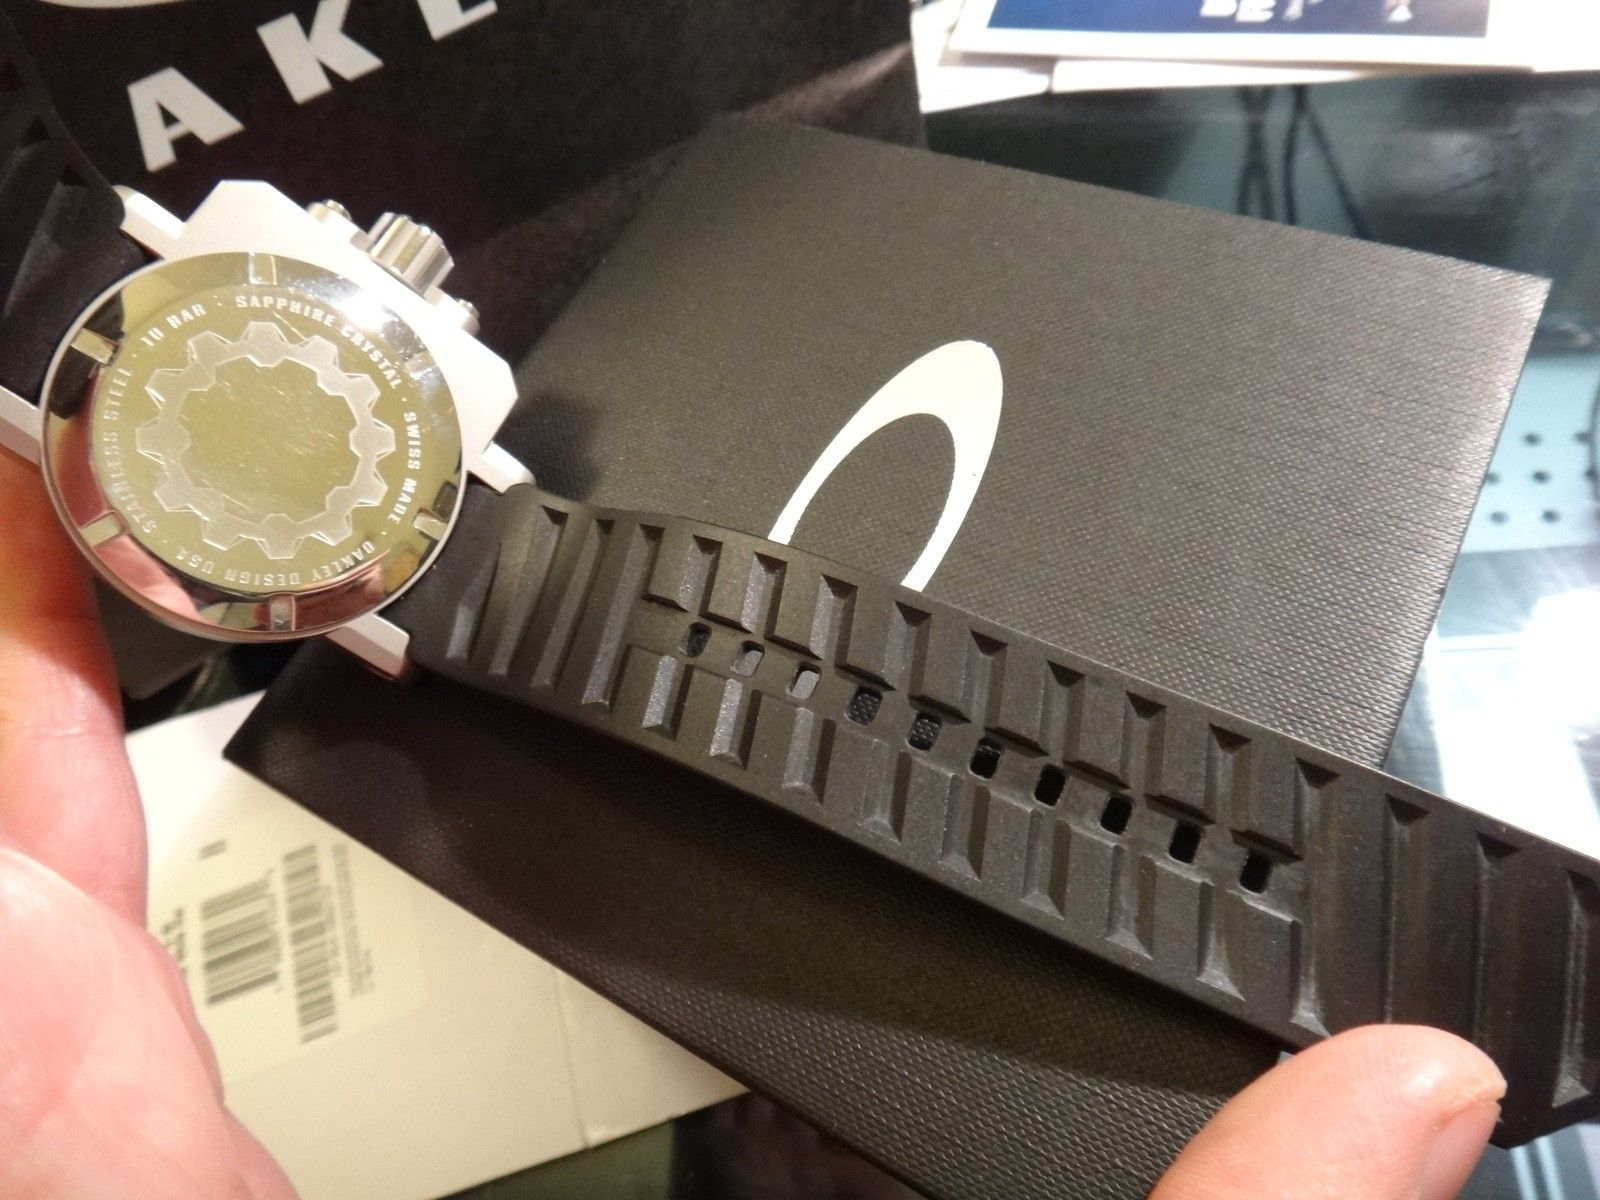 Oakley Gearbox brushed WHITE dial 10-064 stainless steel - DSC05721.JPG